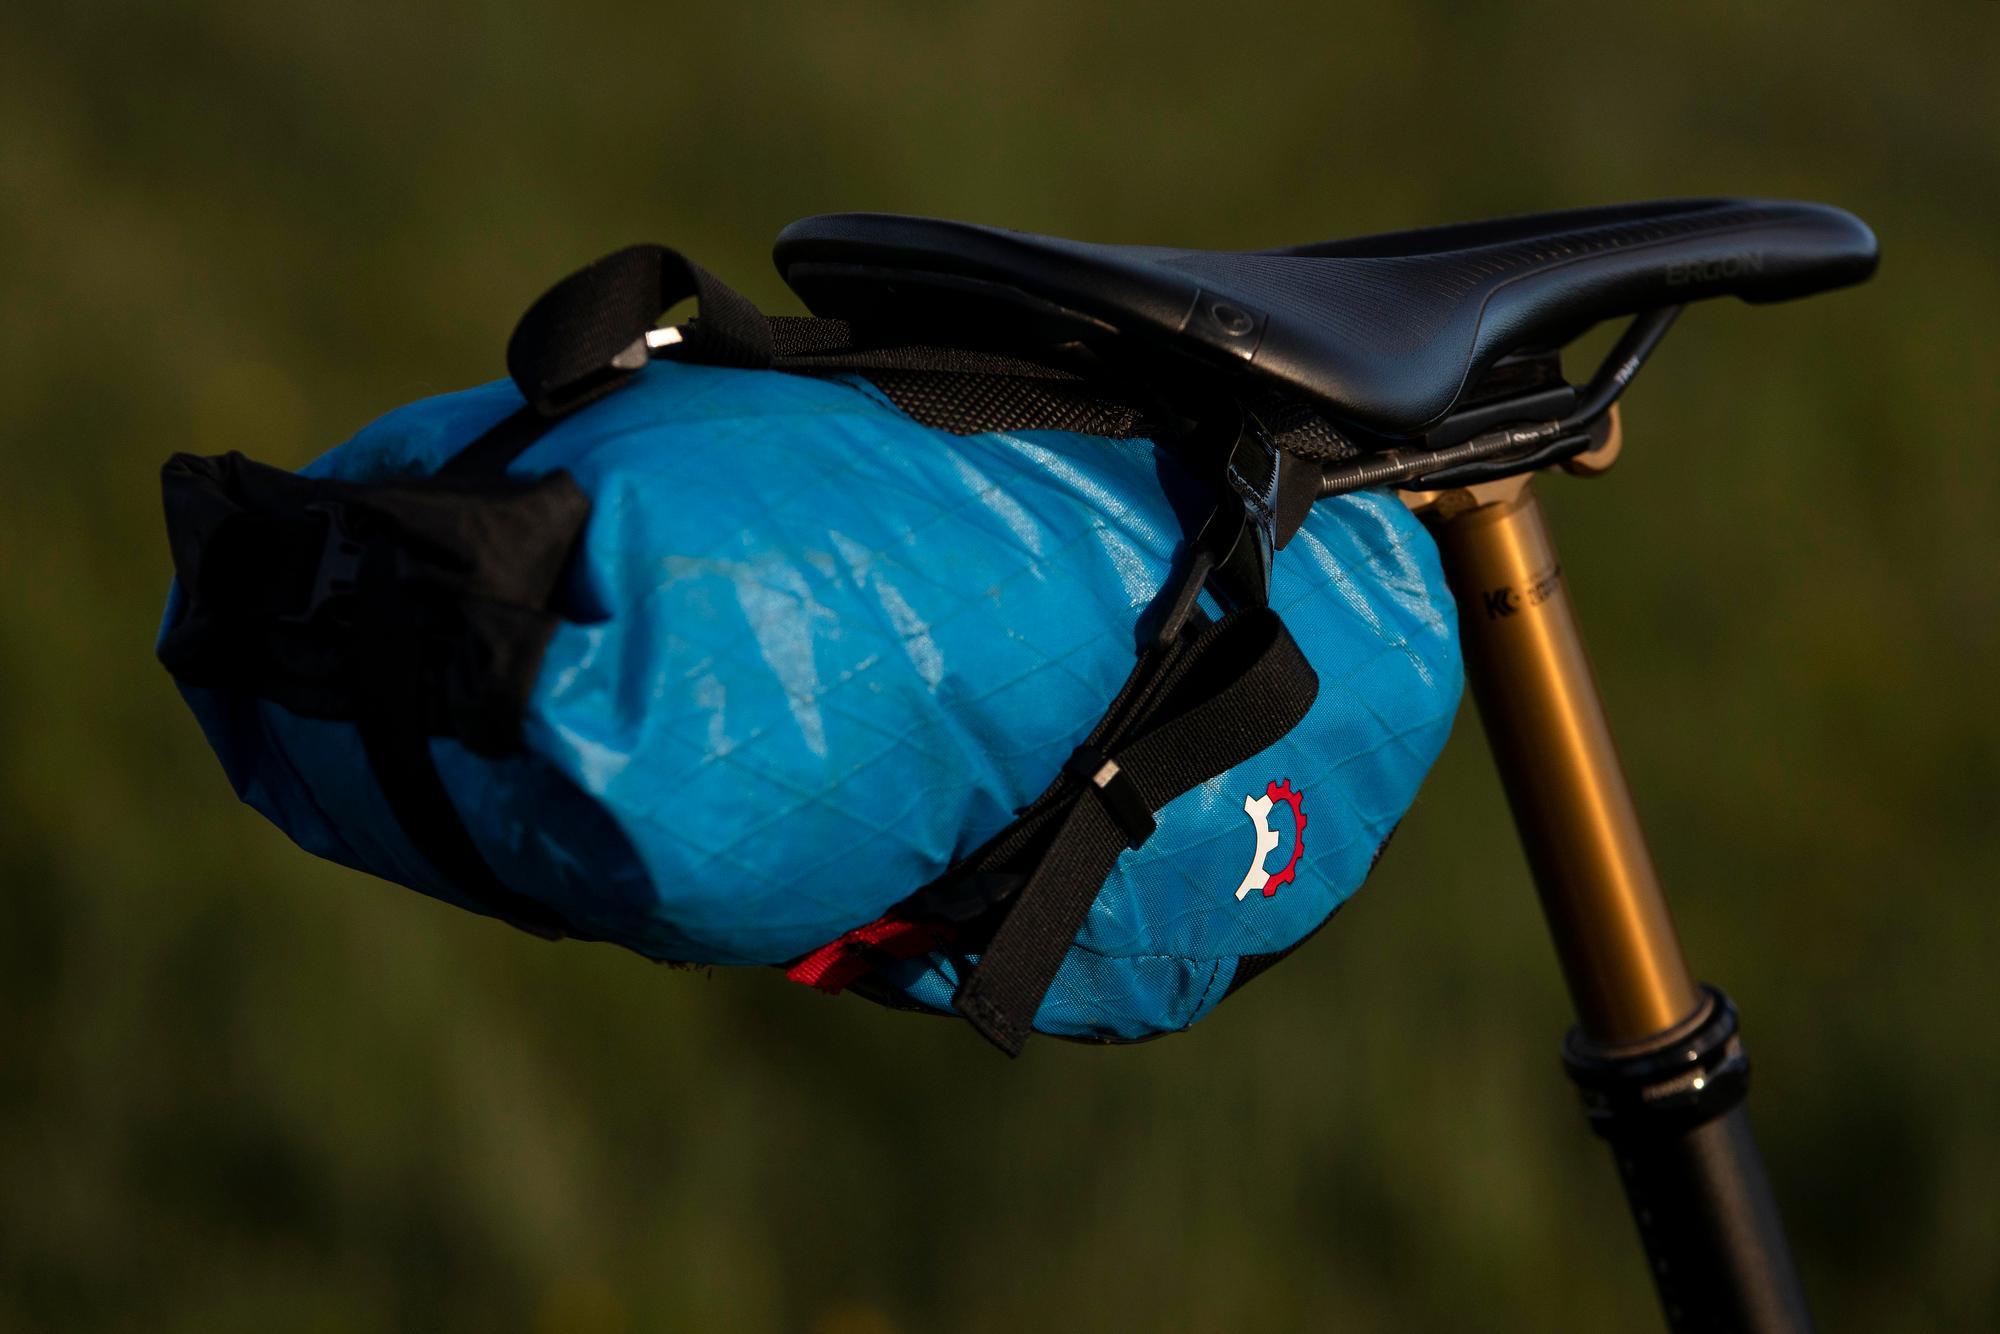 Lael Wilcox Kenai 250 Bike & Gear 027